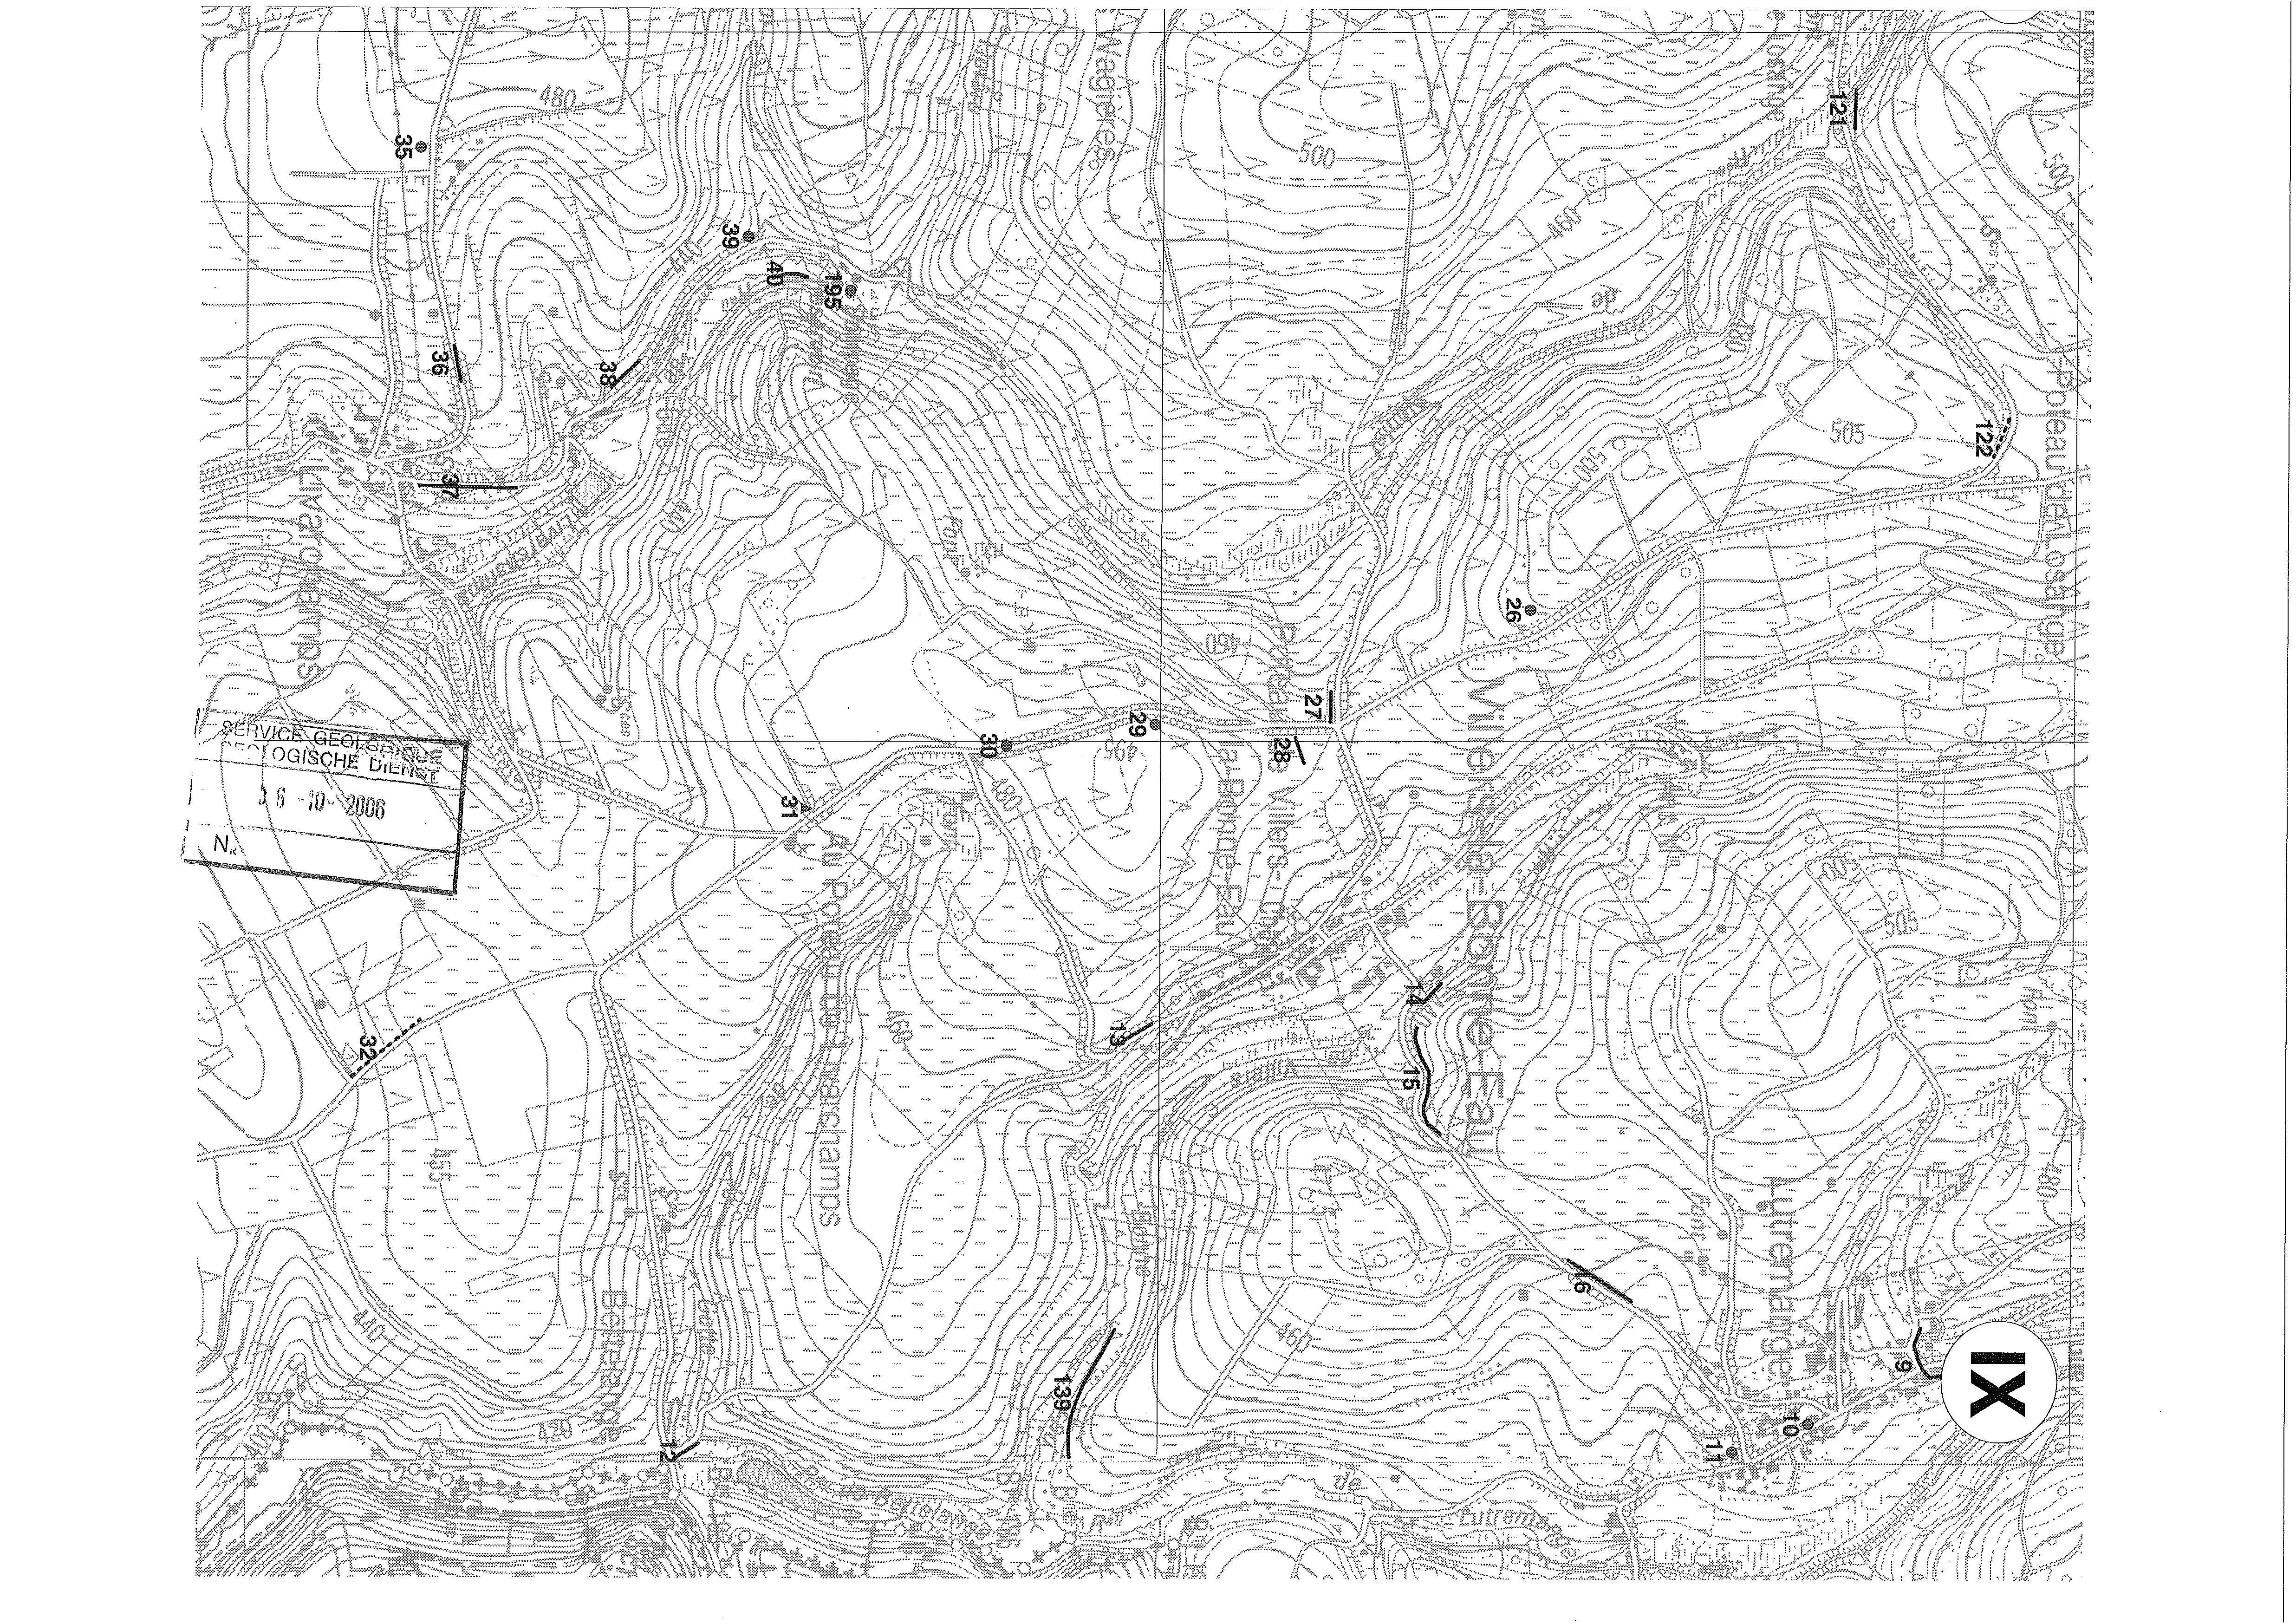 205W_Bastogne_Page_9_Image_0001.jpg